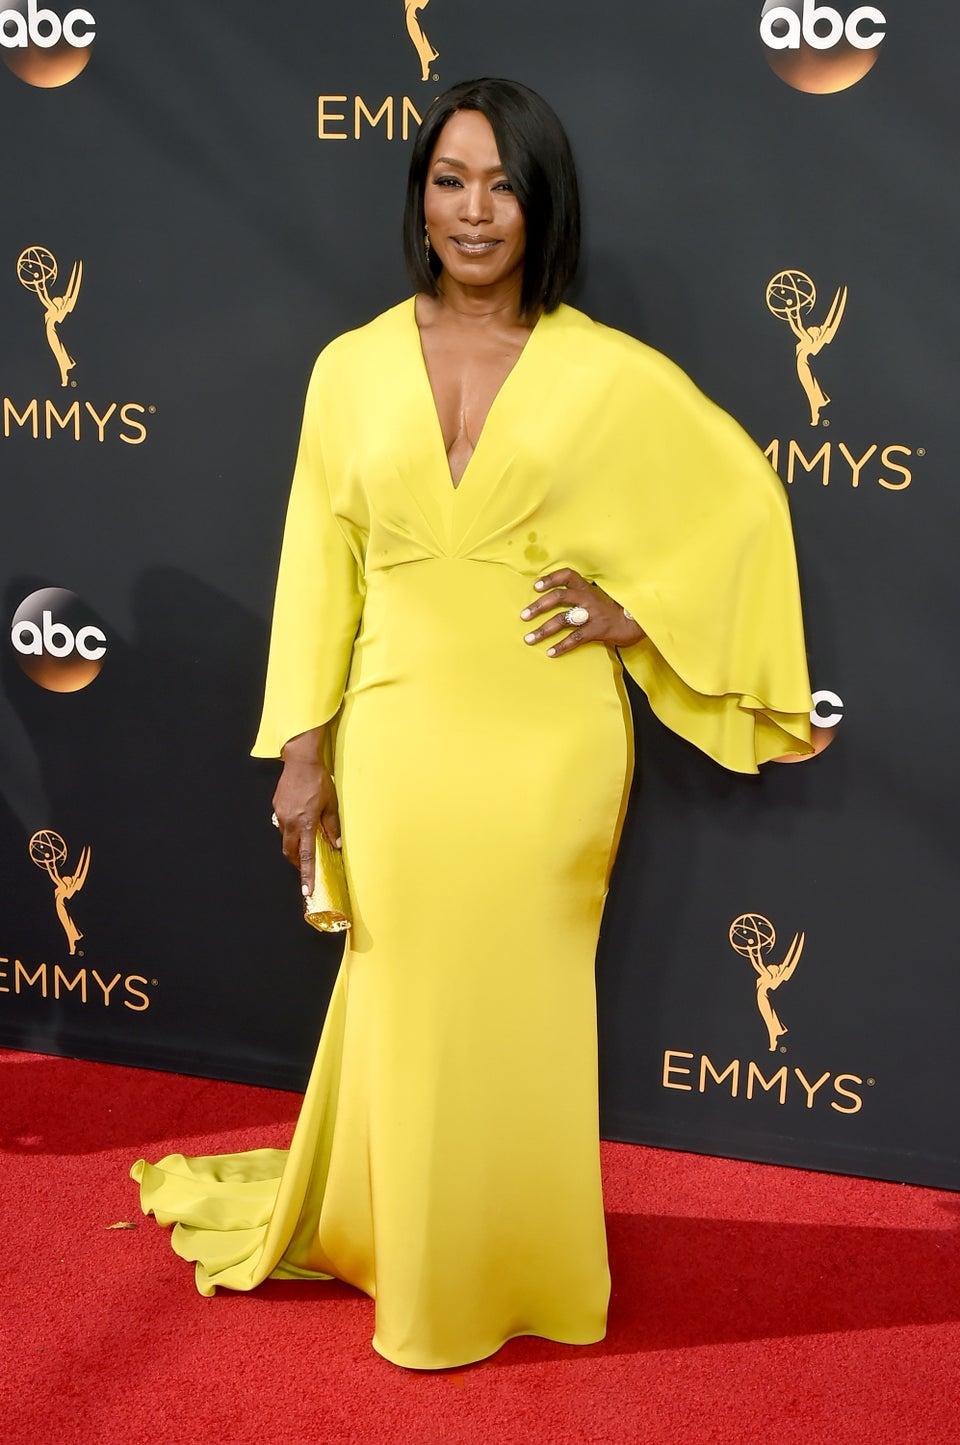 Is Angela Bassett Wearing Lane Bryant on the Emmys Red Carpet?